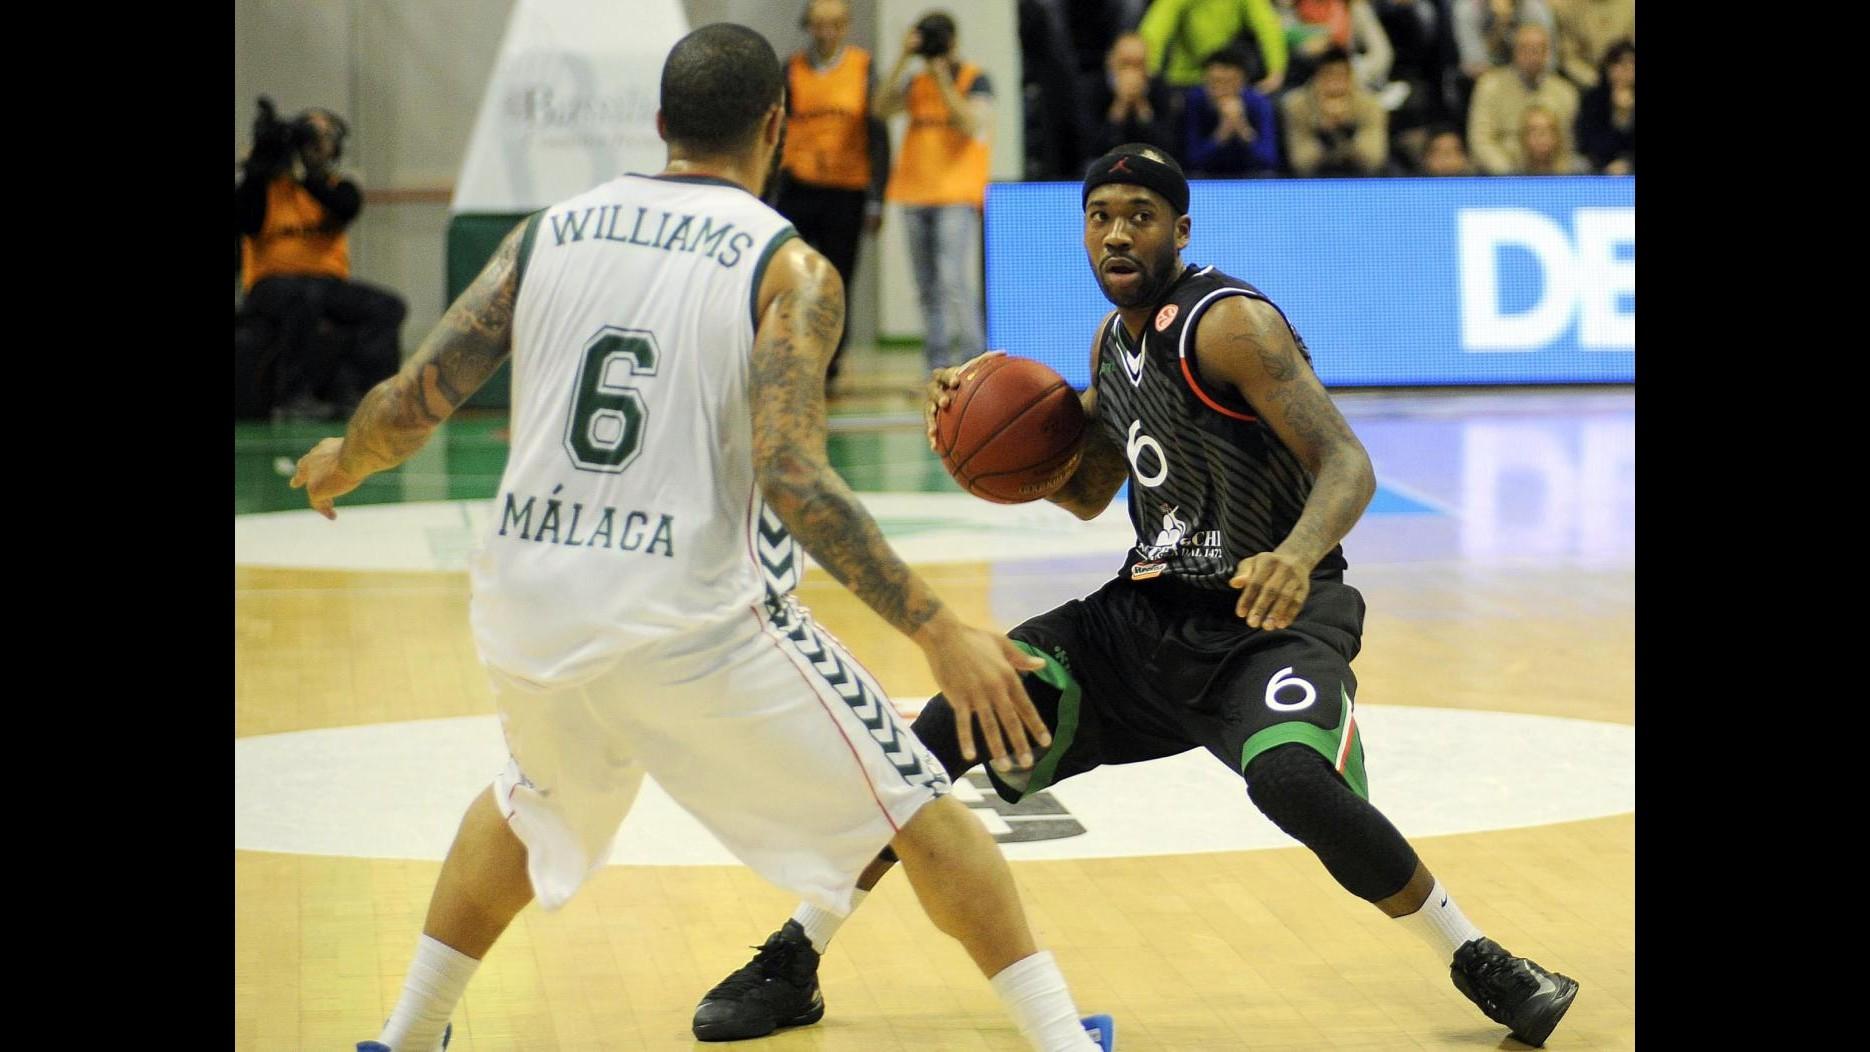 Basket, Eurolega: Siena spazza via Malaga 91-72 e vola alle Top 16